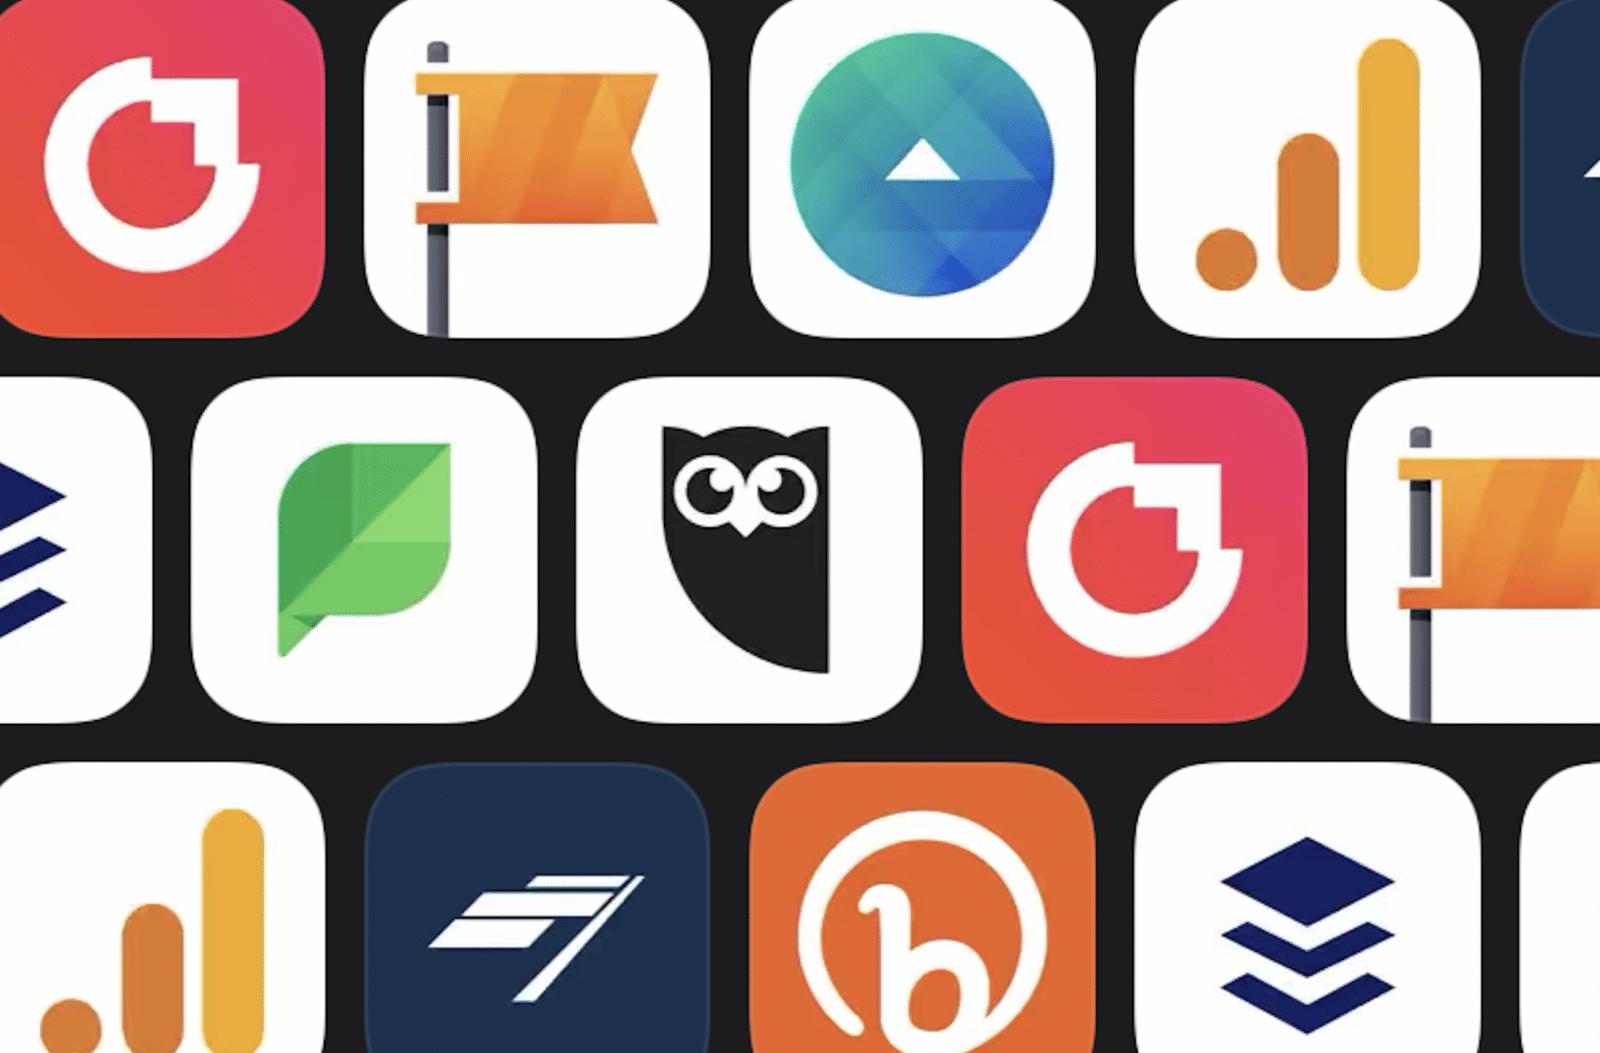 Apple แนะนำแอพช่วยจัดการคอนเทนต์ สำหรับ Blogger, Influencer